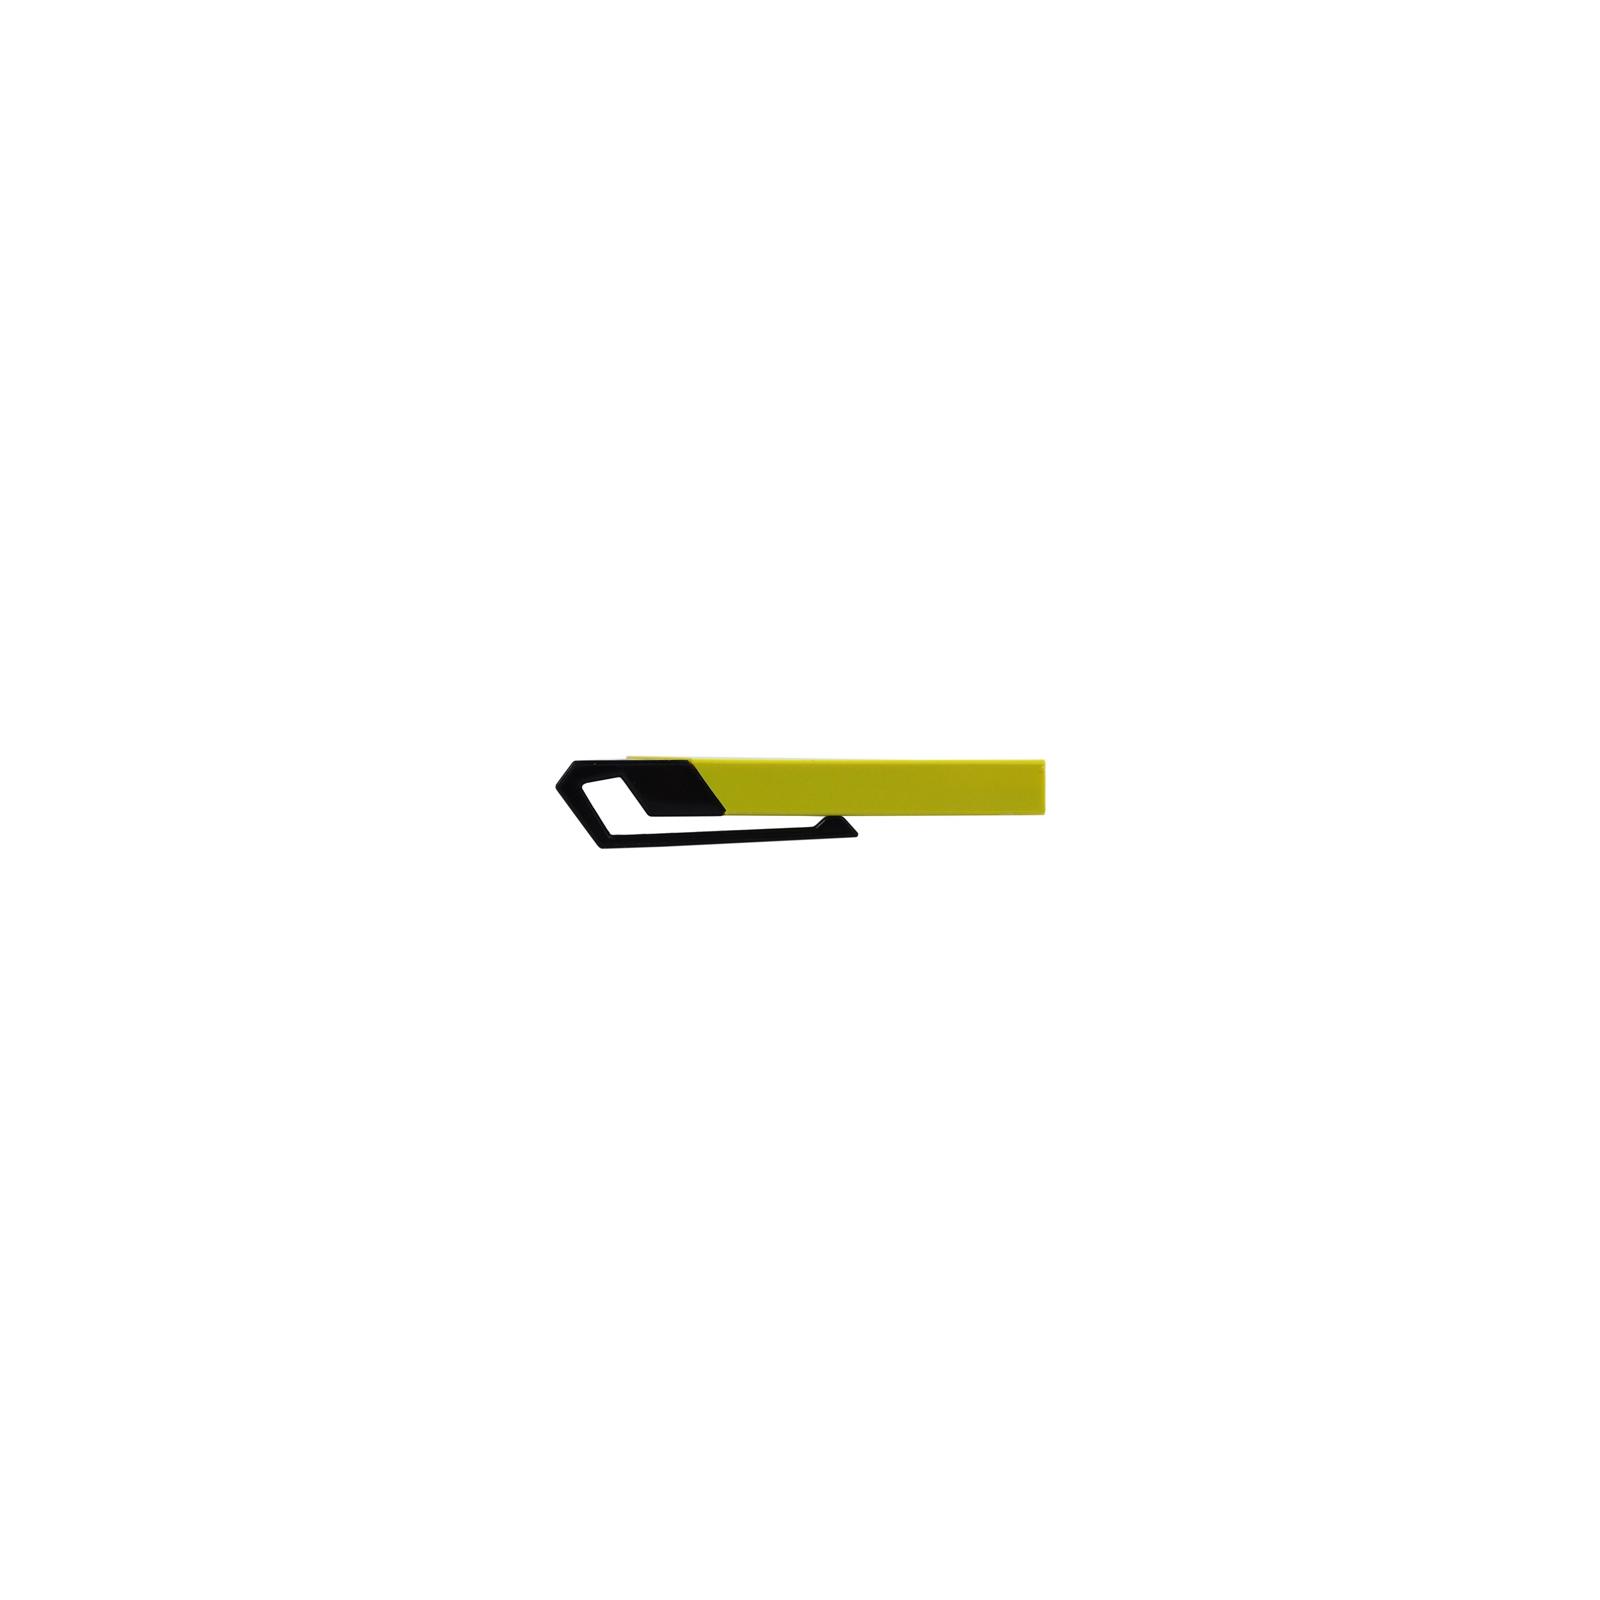 USB флеш накопитель 16GB AH131 Yellow RP USB2.0 Apacer (AP16GAH131Y-1) изображение 3